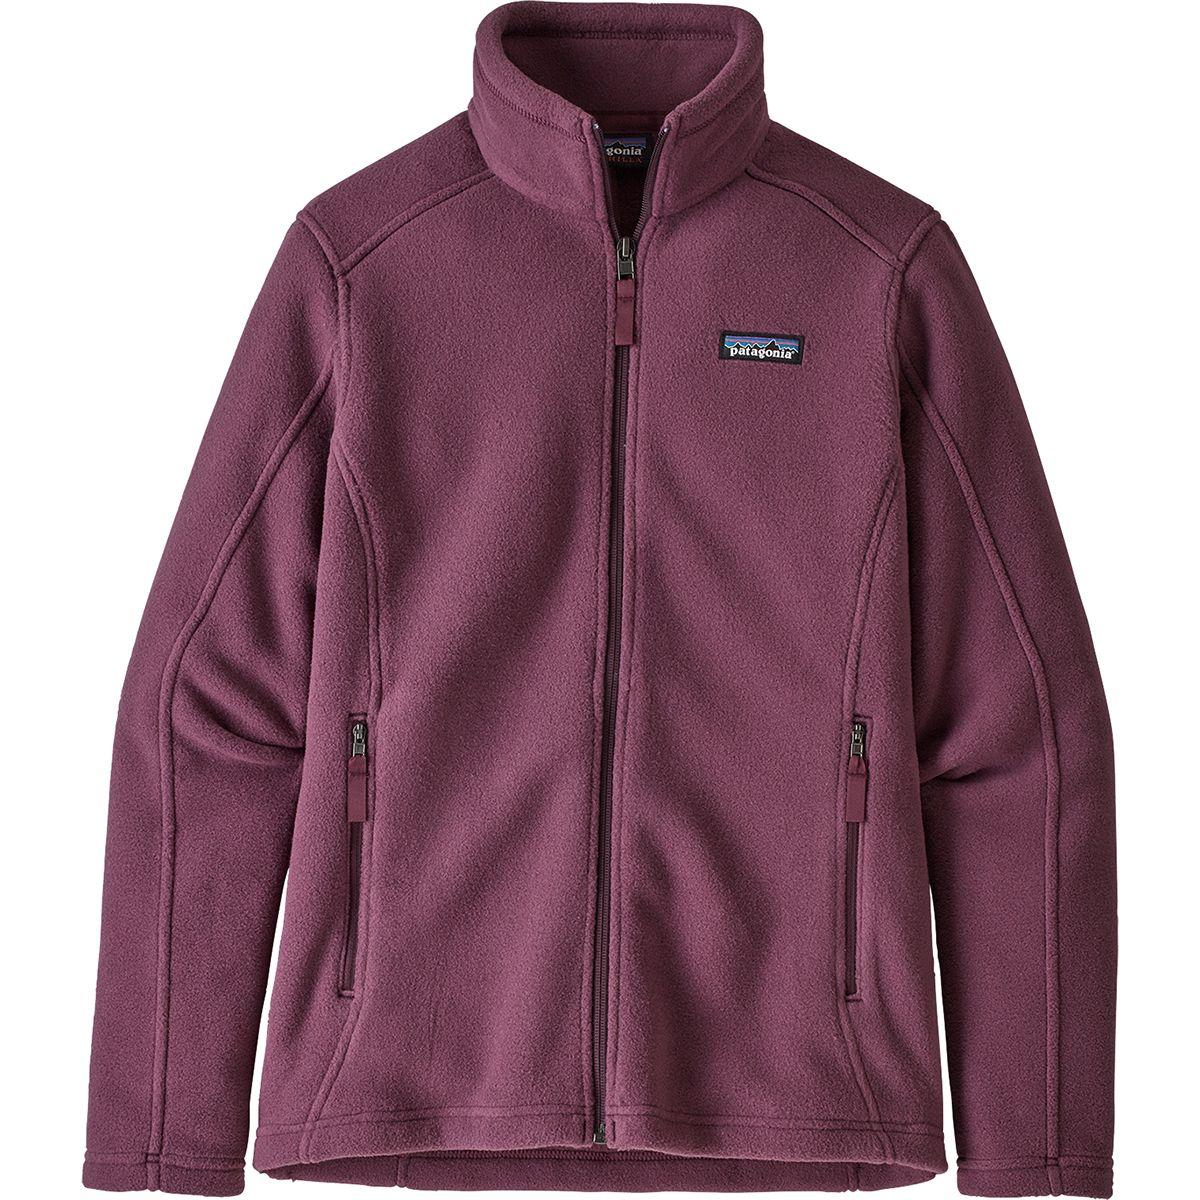 Patagonia Synchilla Jacket